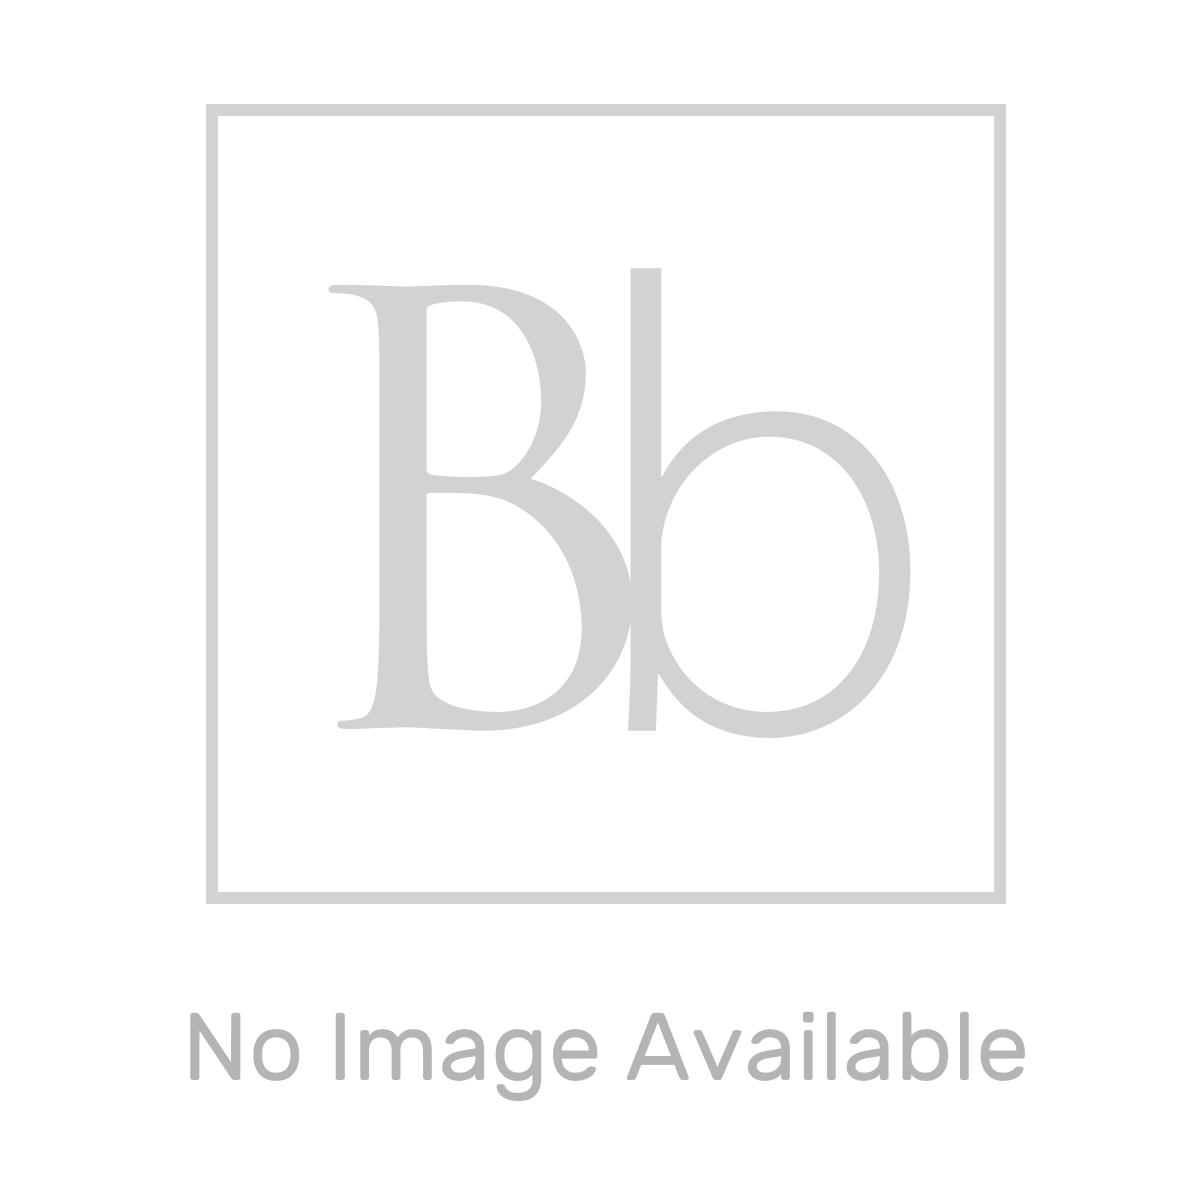 Reina Flat Anthracite Single Panel Aluminium Radiator 600 x 810mm